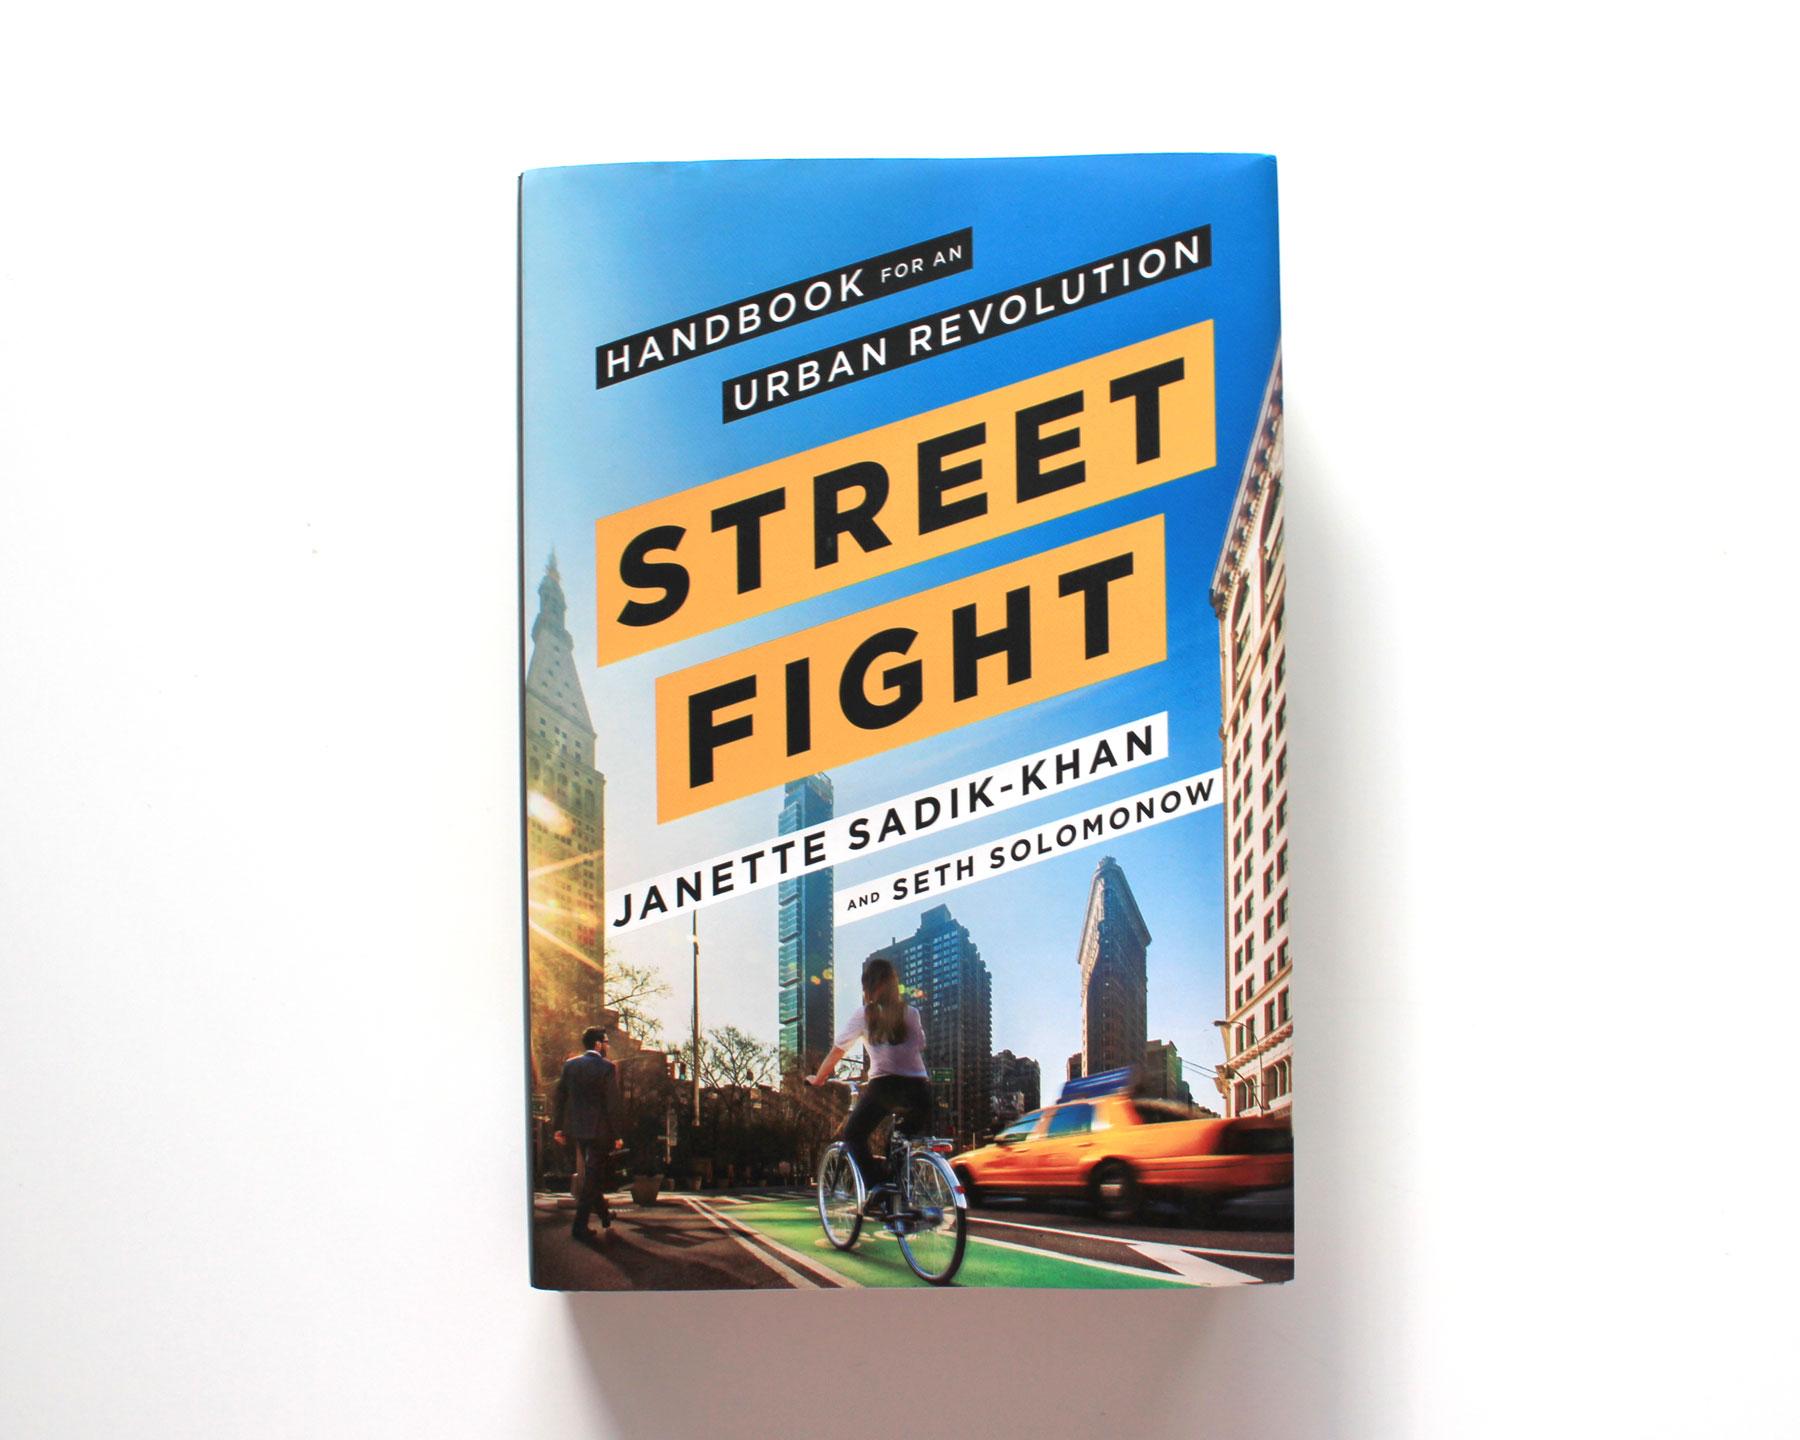 streetfight-janette-sadik-khan